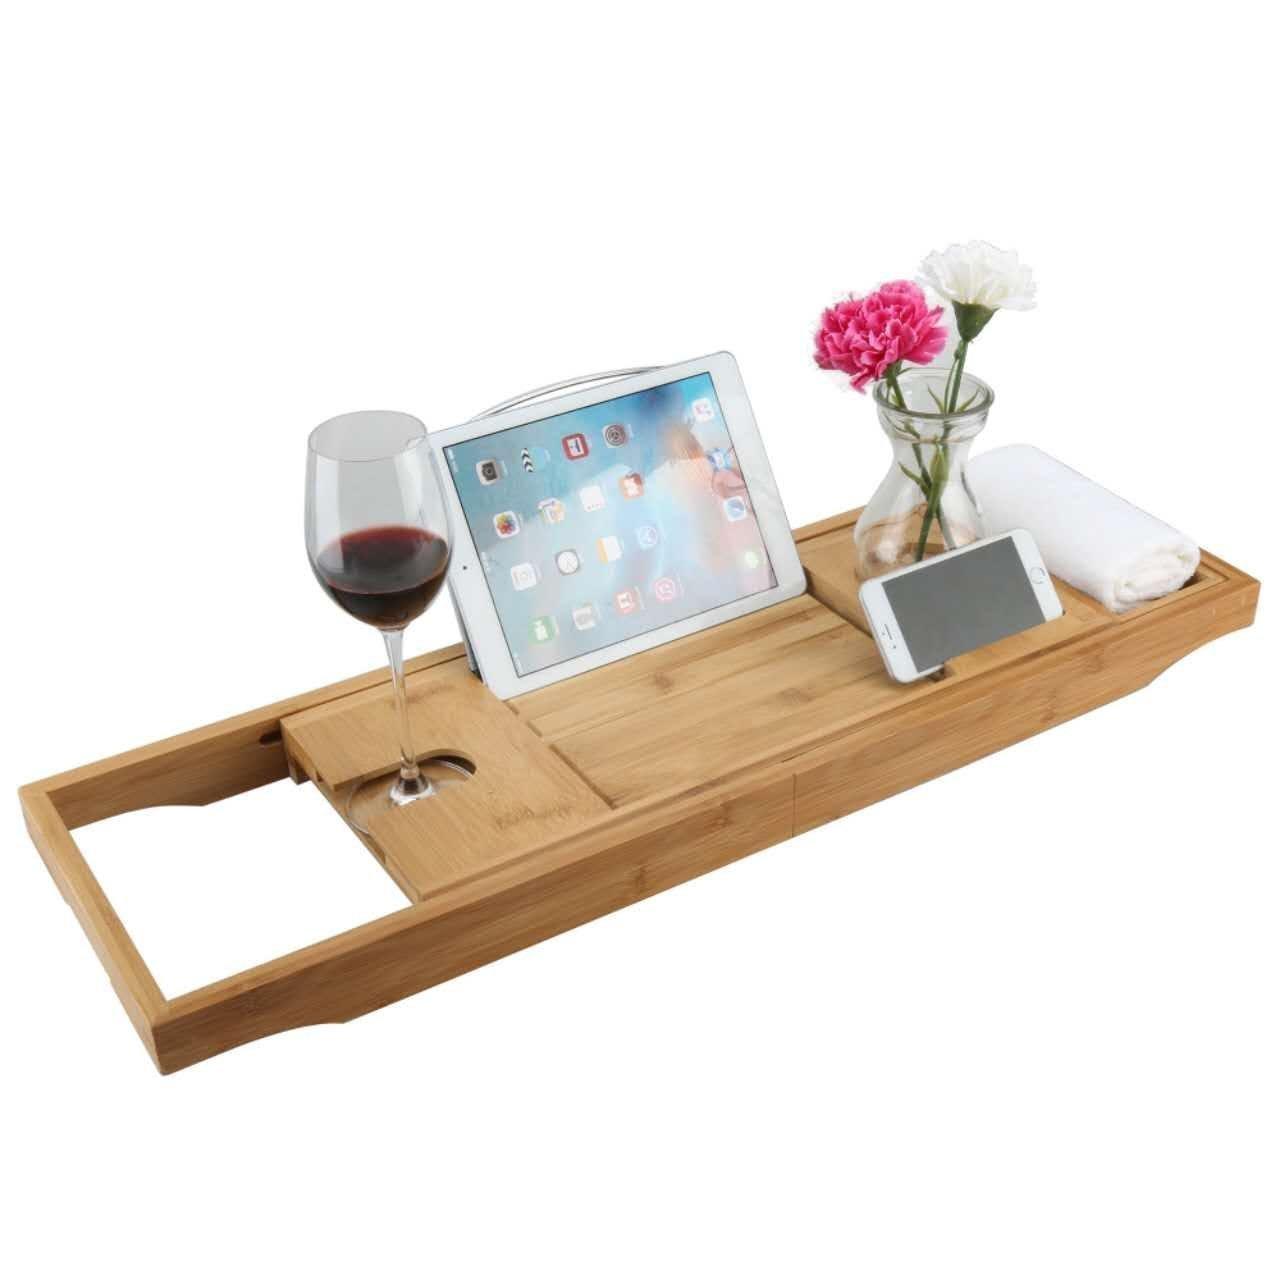 Best tray for bathtub   Amazon.com